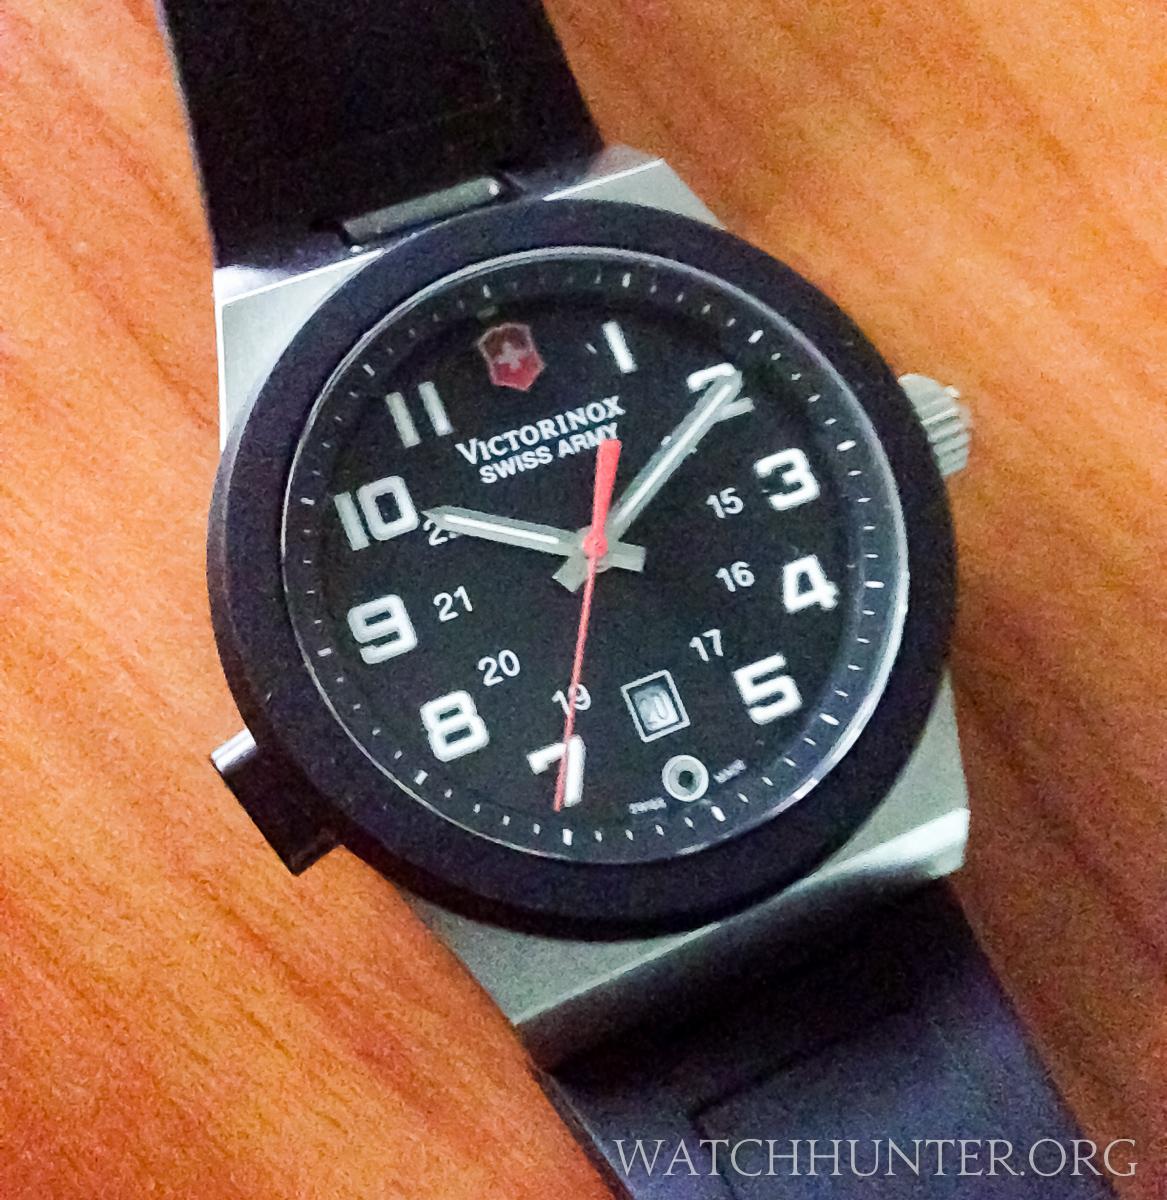 1f66a4360170 MEET THE WATCH: Victorinox Swiss Army Night Vision Flashlight Watch ...